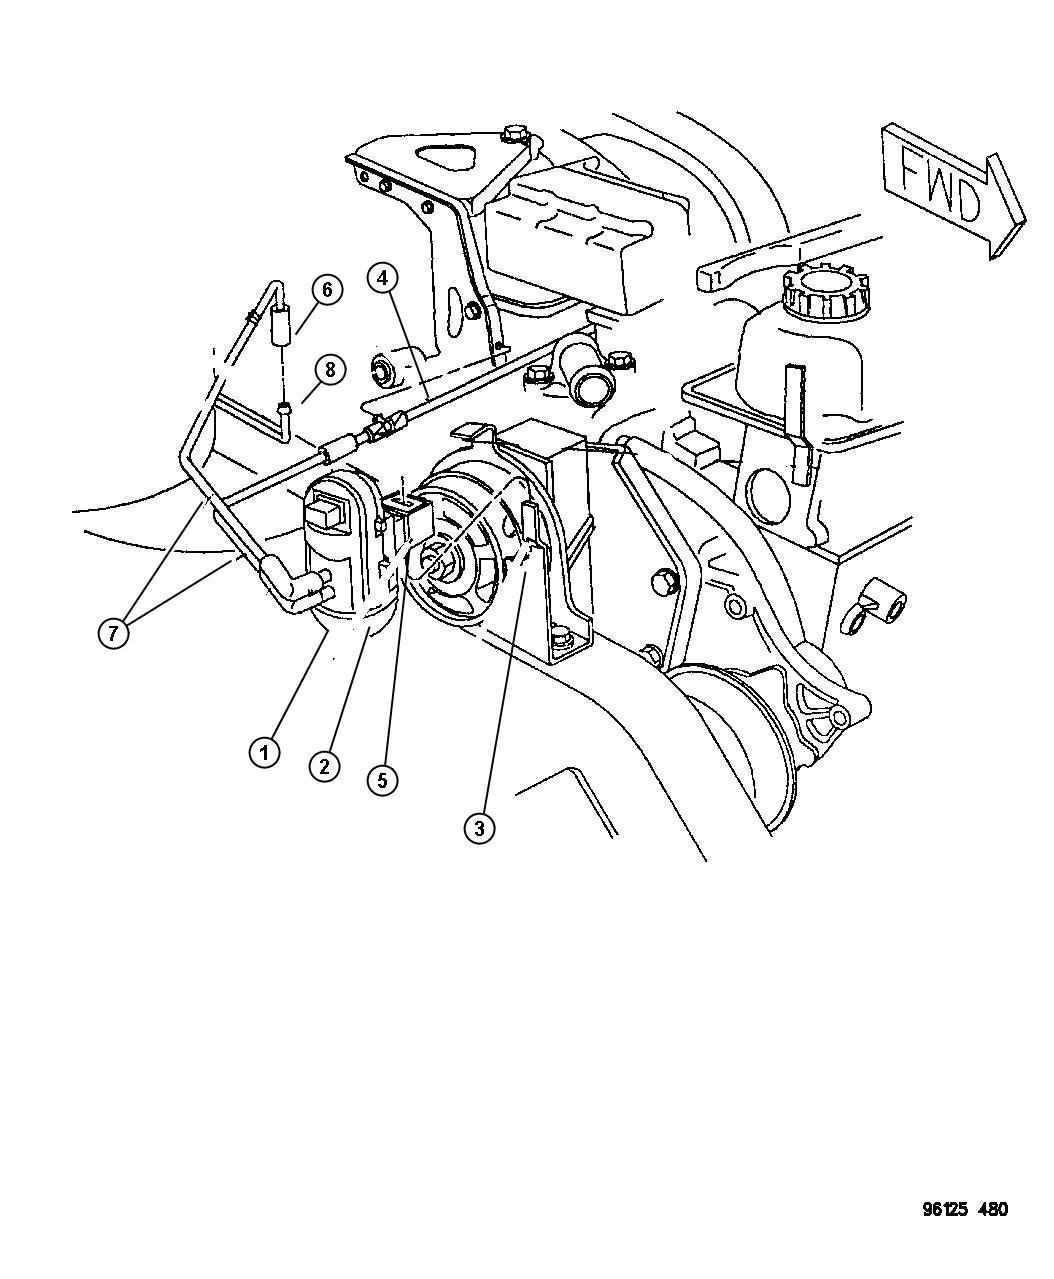 Dodge Caravan Harness Duty Cycle Purge Solenoid